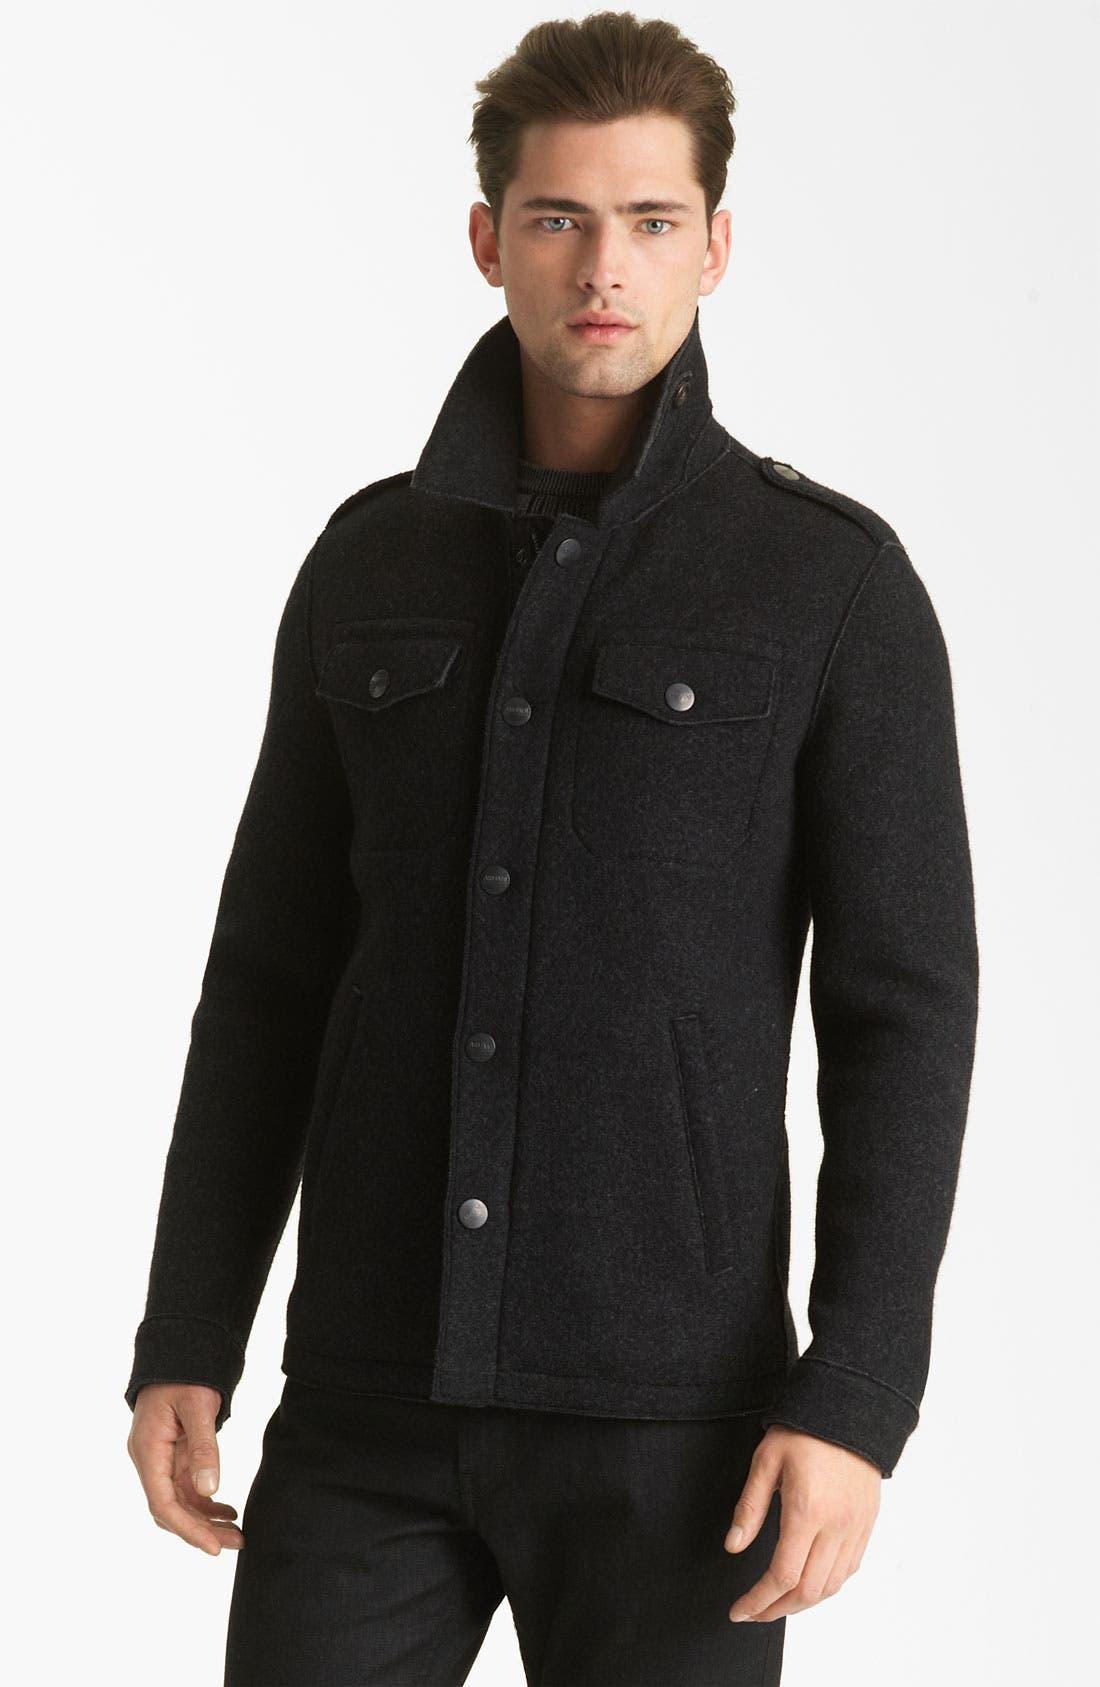 Alternate Image 1 Selected - Armani Collezioni Boiled Wool Military Jacket